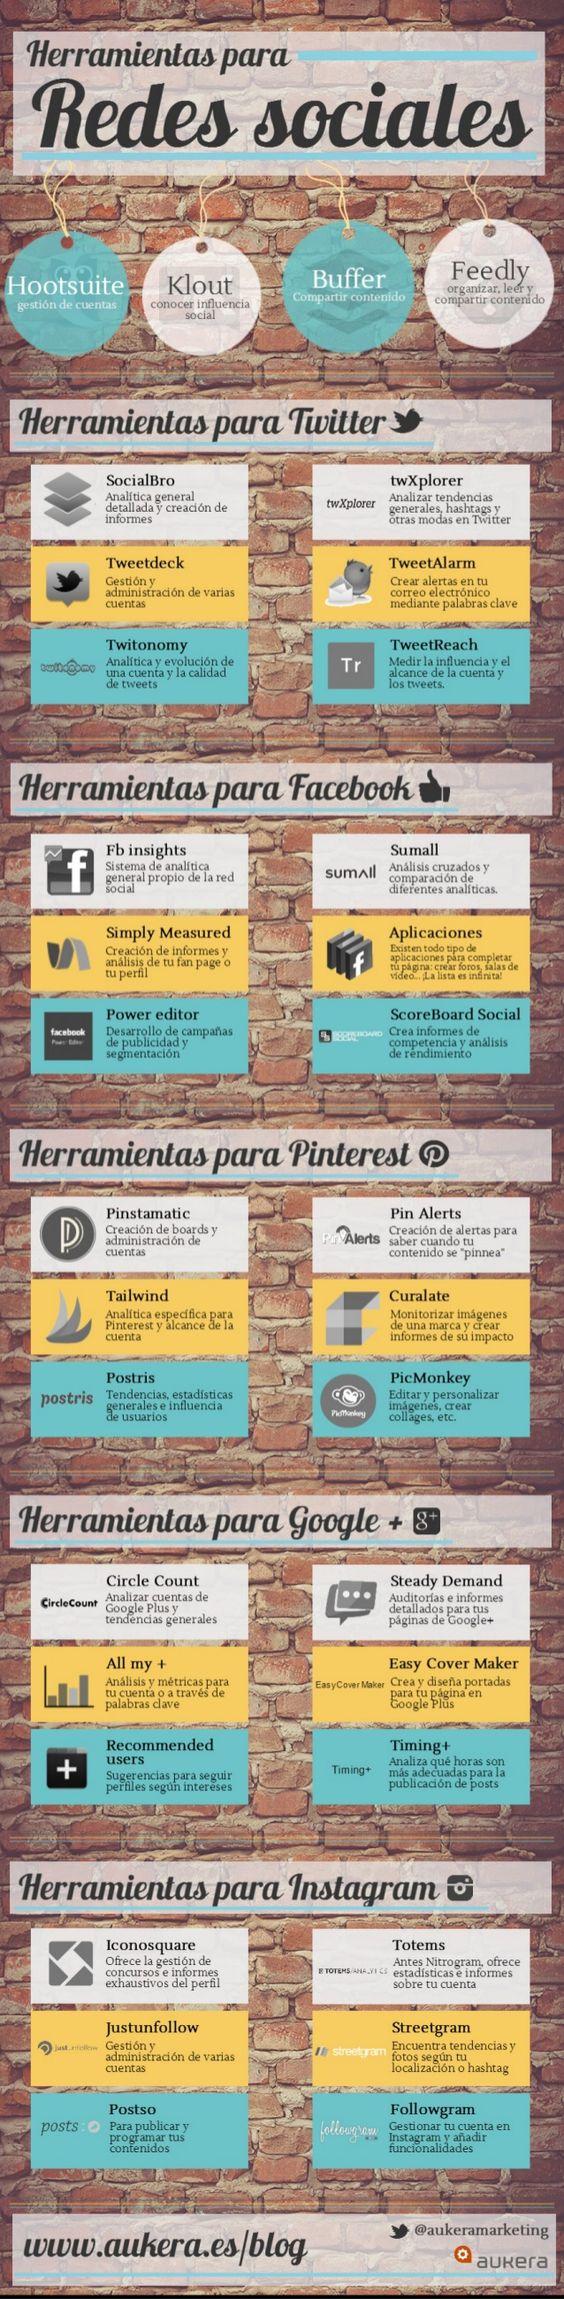 Social Media, Community Management Tools, Dashboards   Herramientas para redes sociales #socialmedia #redessociales…